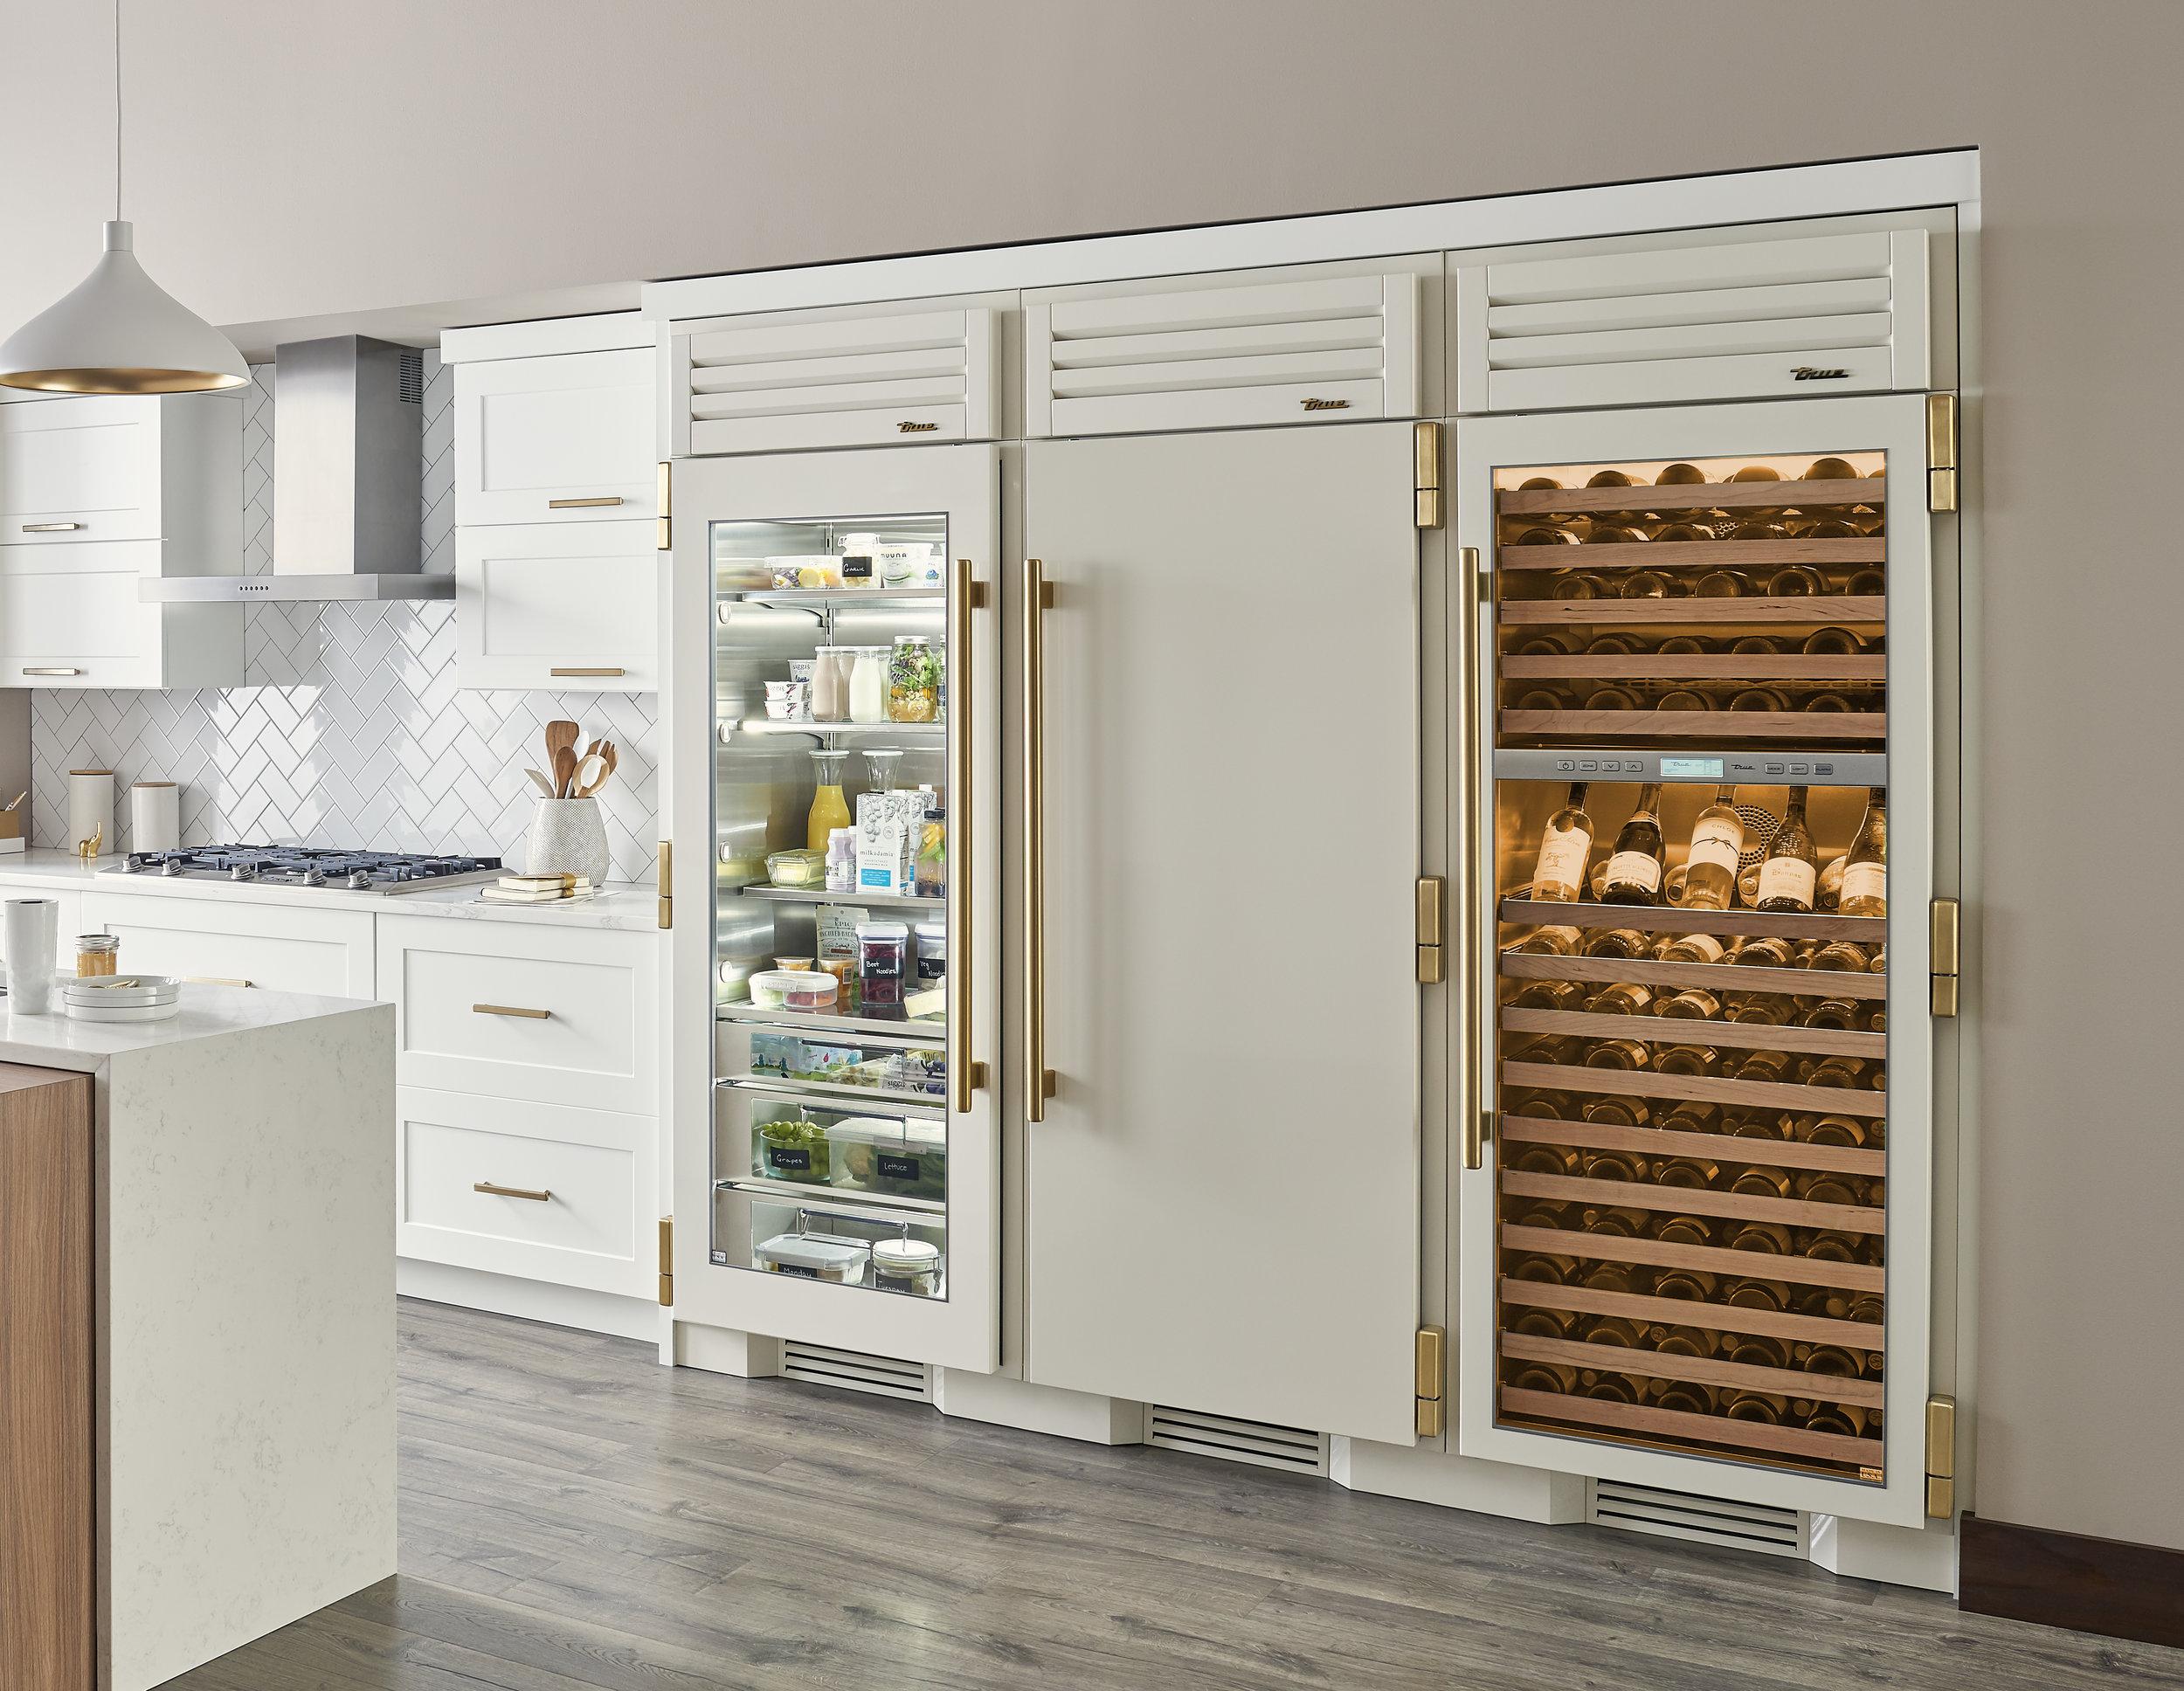 See-Through Refrigerator True Manufacturing